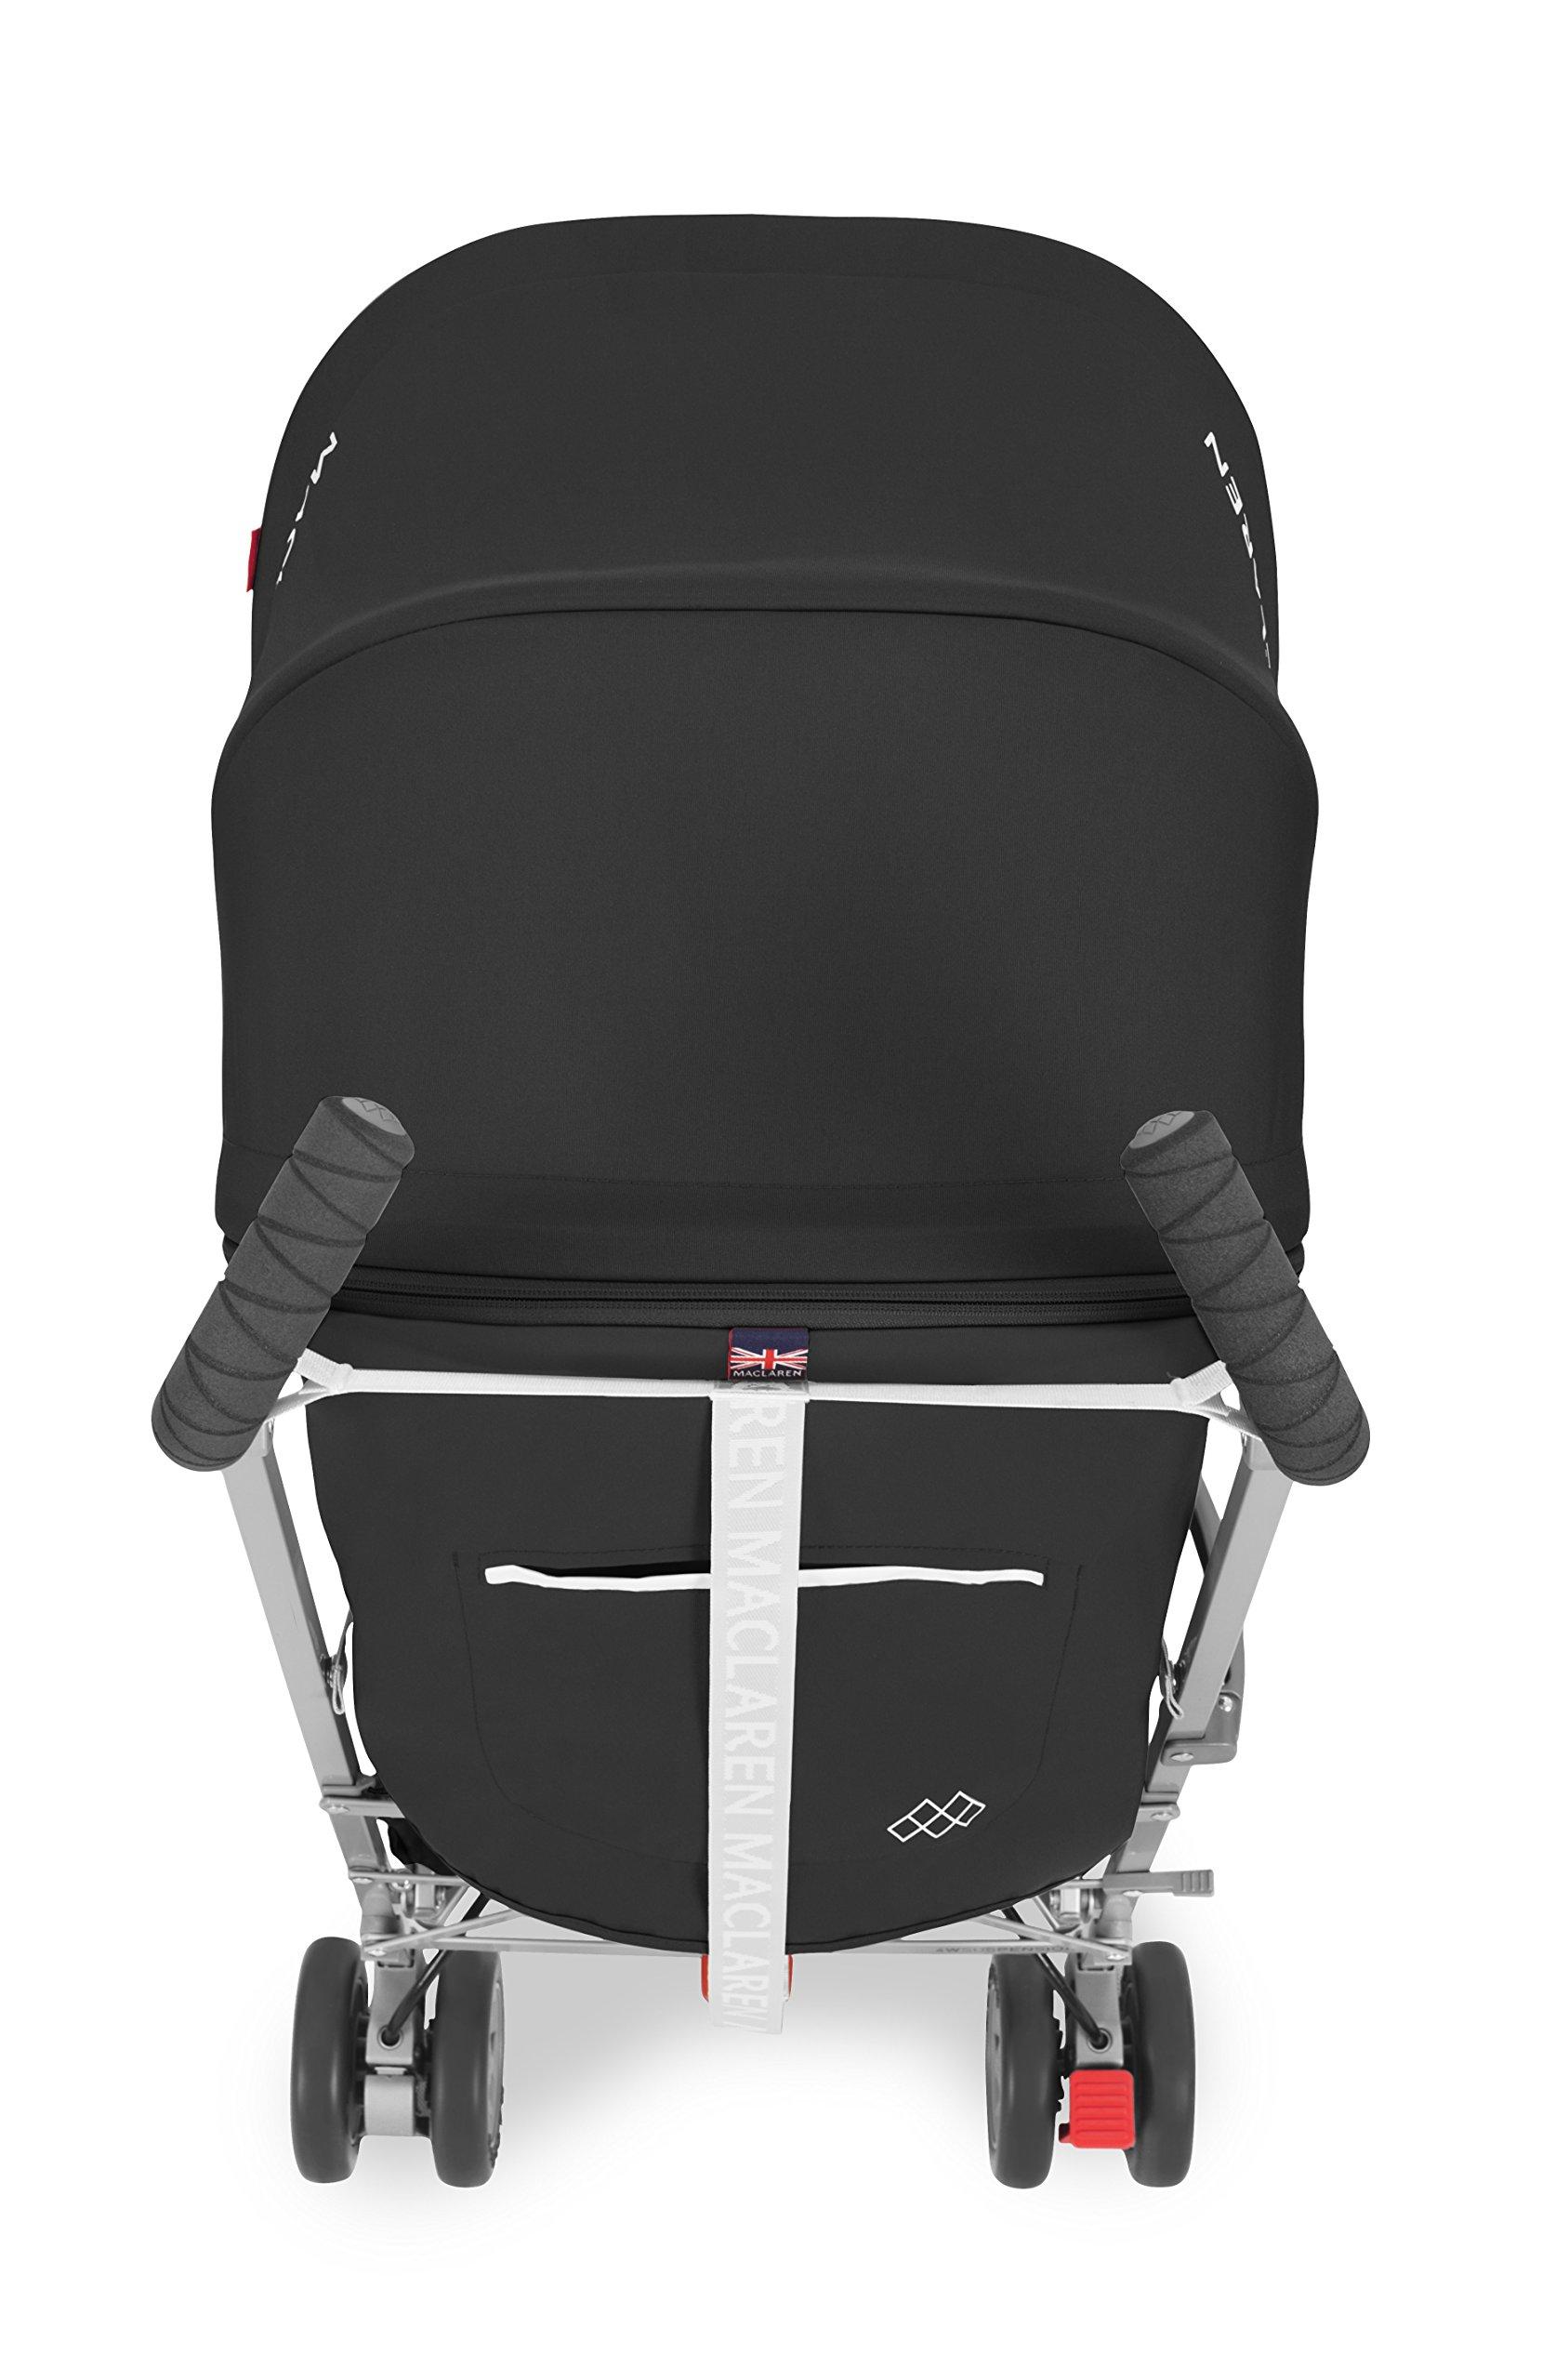 Maclaren Globetrotter Stroller - lightweight, compact by Maclaren (Image #5)